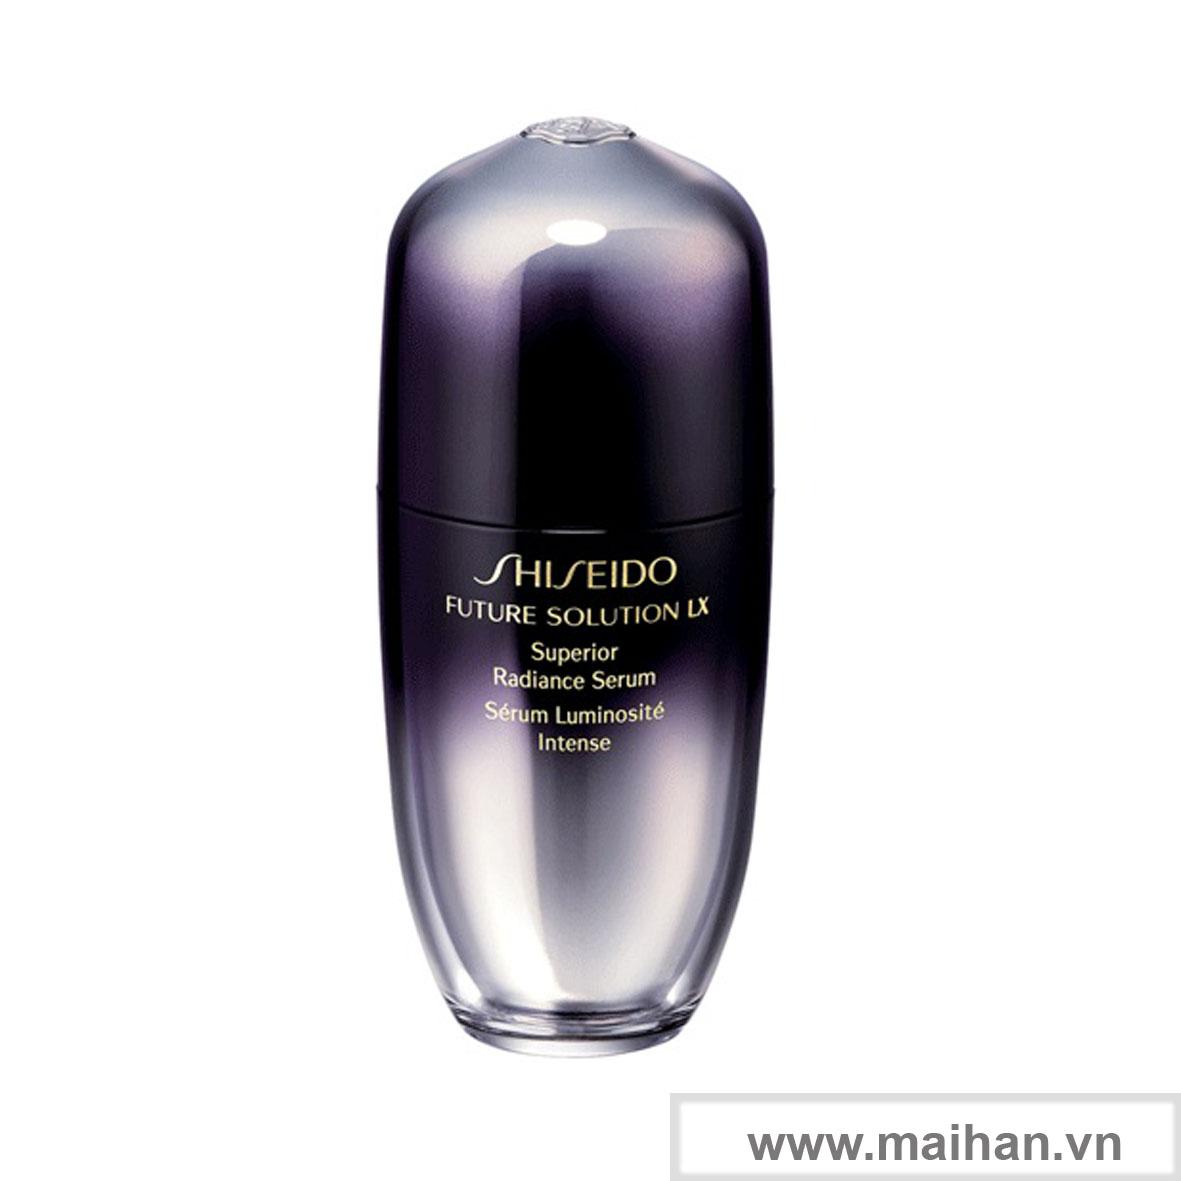 Tinh chất sáng da Shiseido Future Solution LX